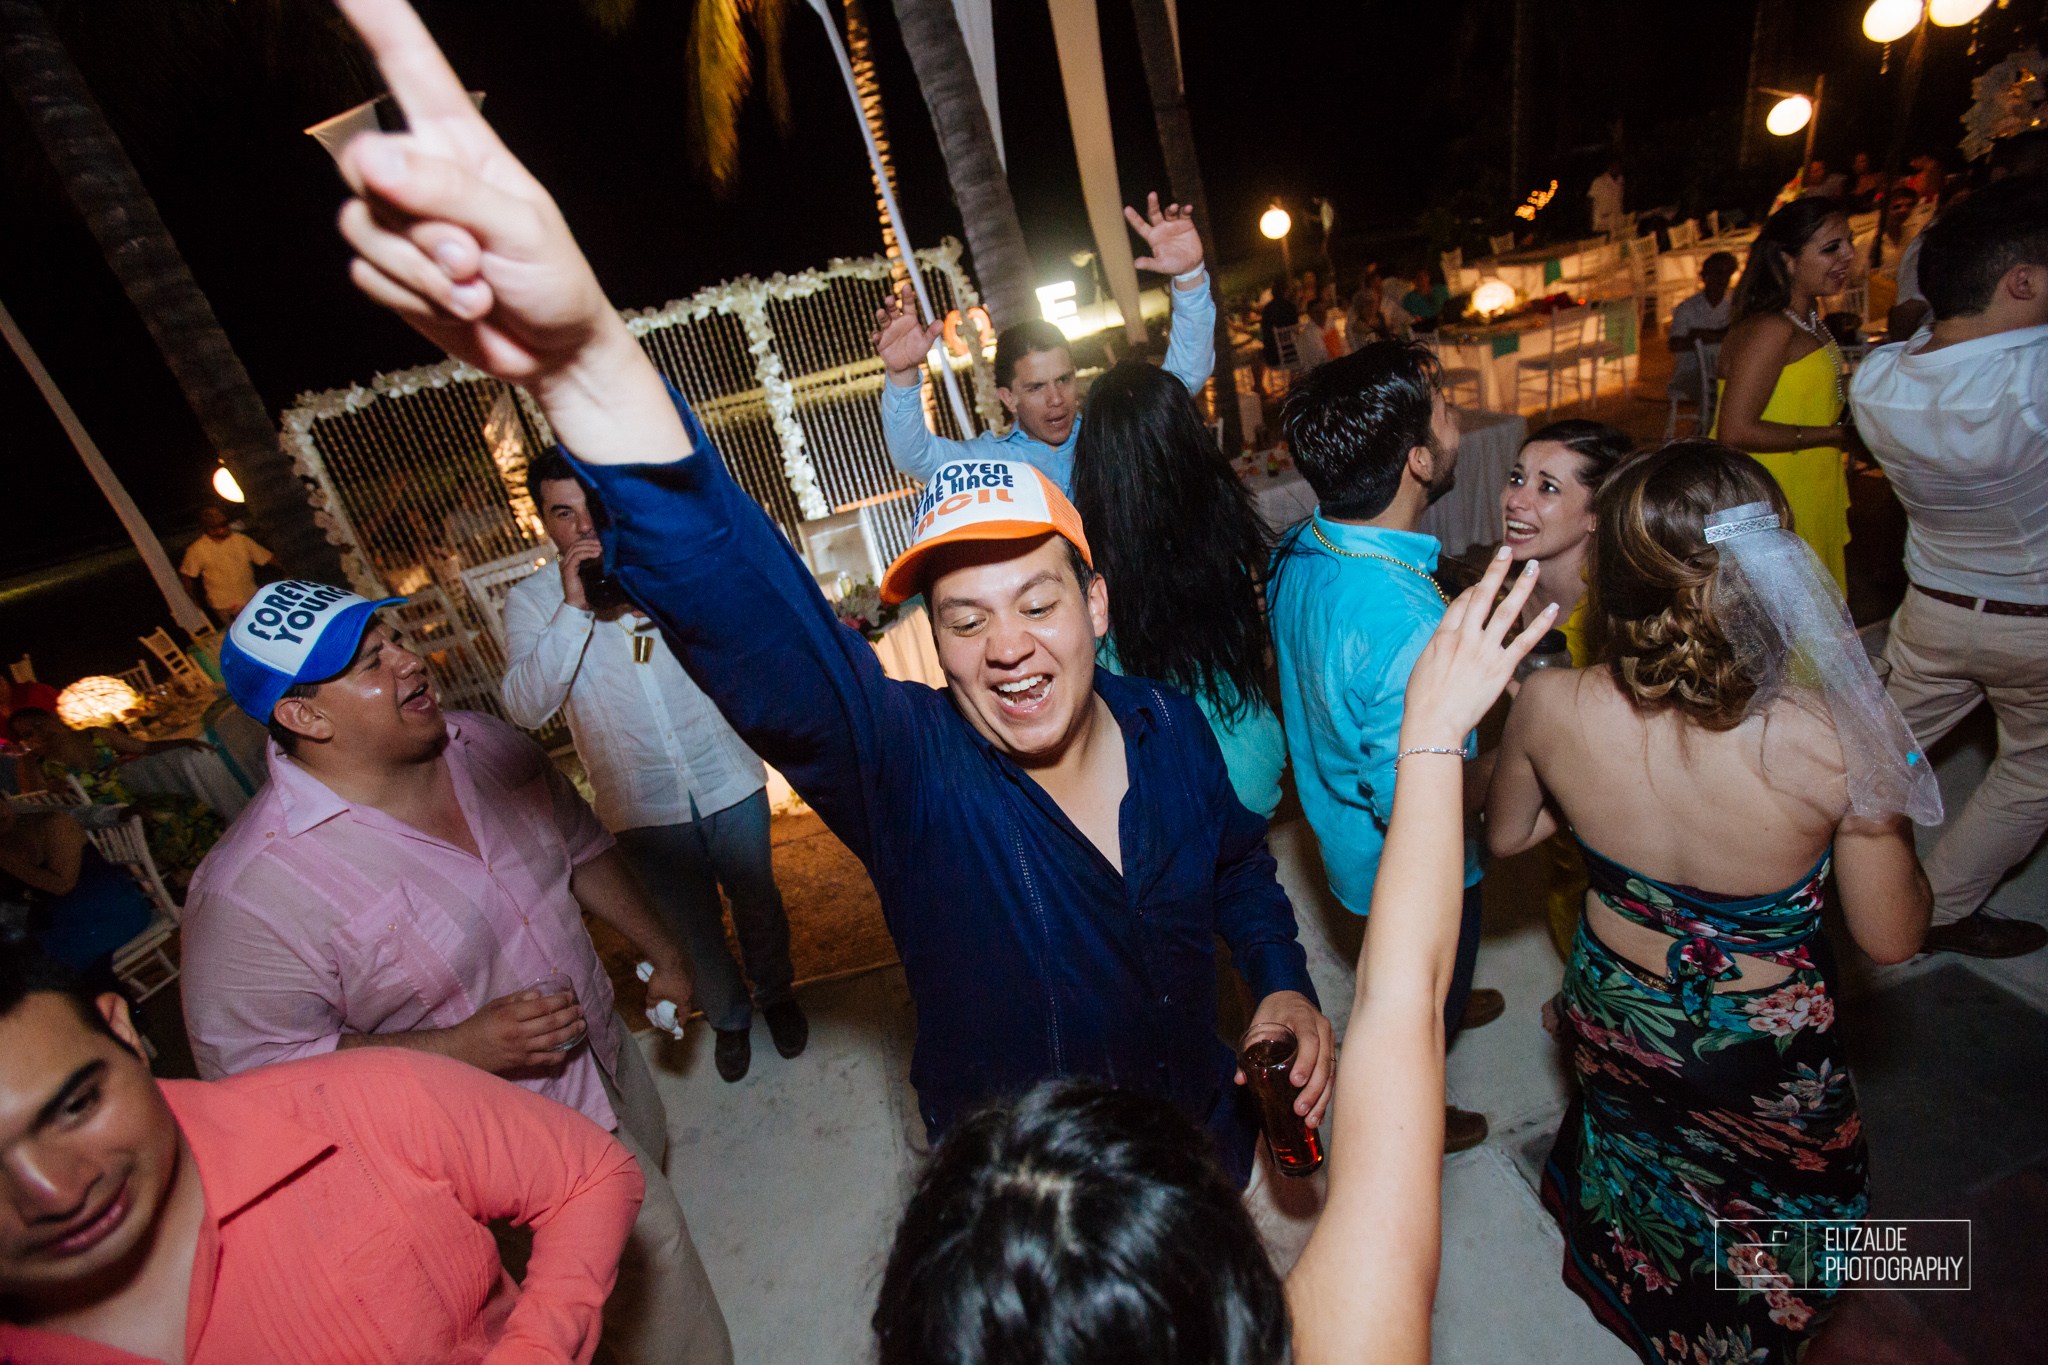 Pay and Ferran_Acapulco_Destination Wedding_Elizalde Photography-190.jpg